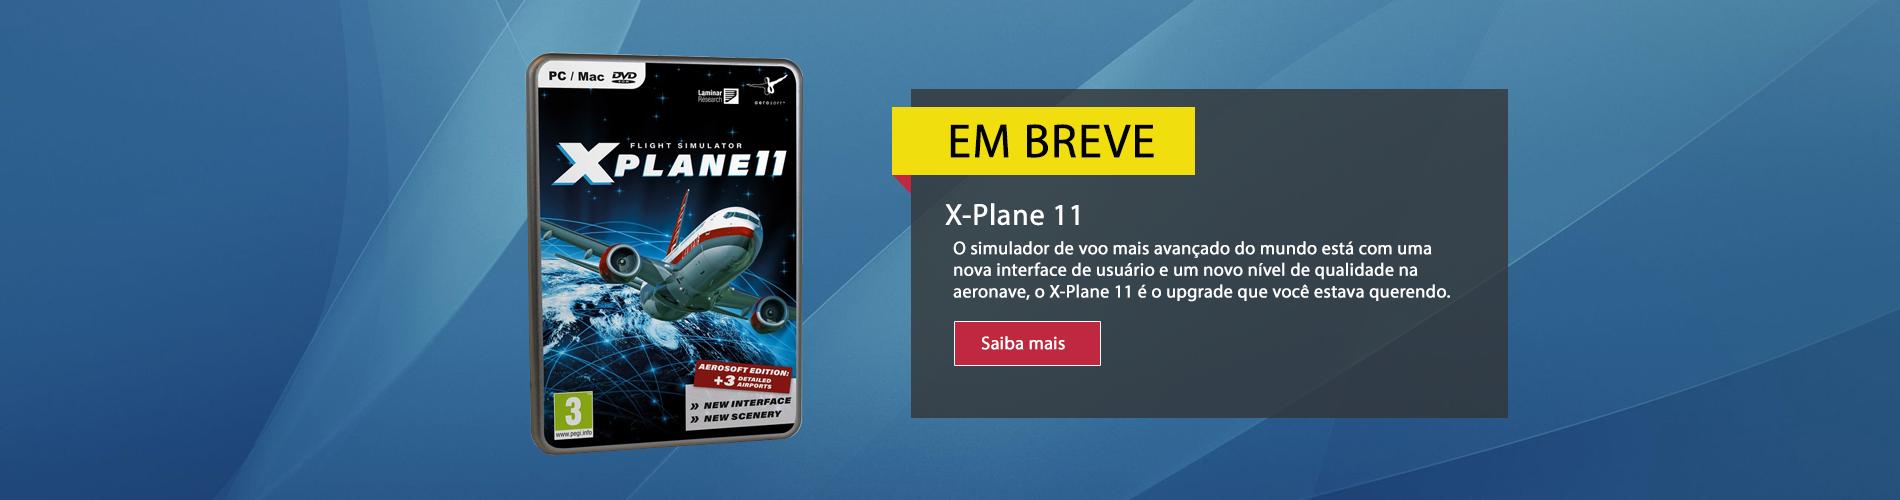 slide_x-plane